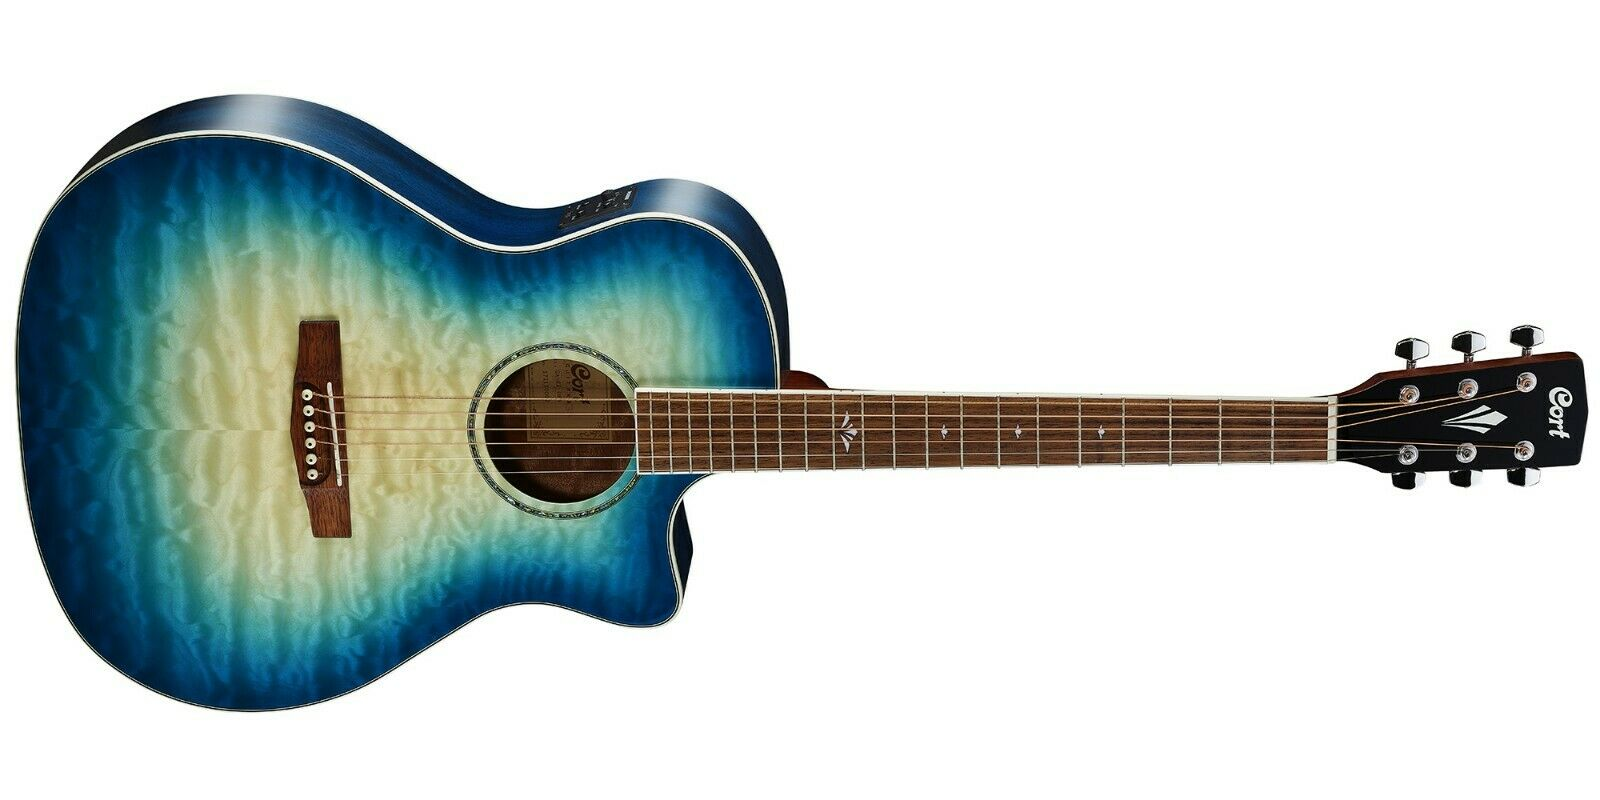 Cort Electro Acoustic Guitar With Bag - Grand Regal Series - GA-QF-BG-CBB